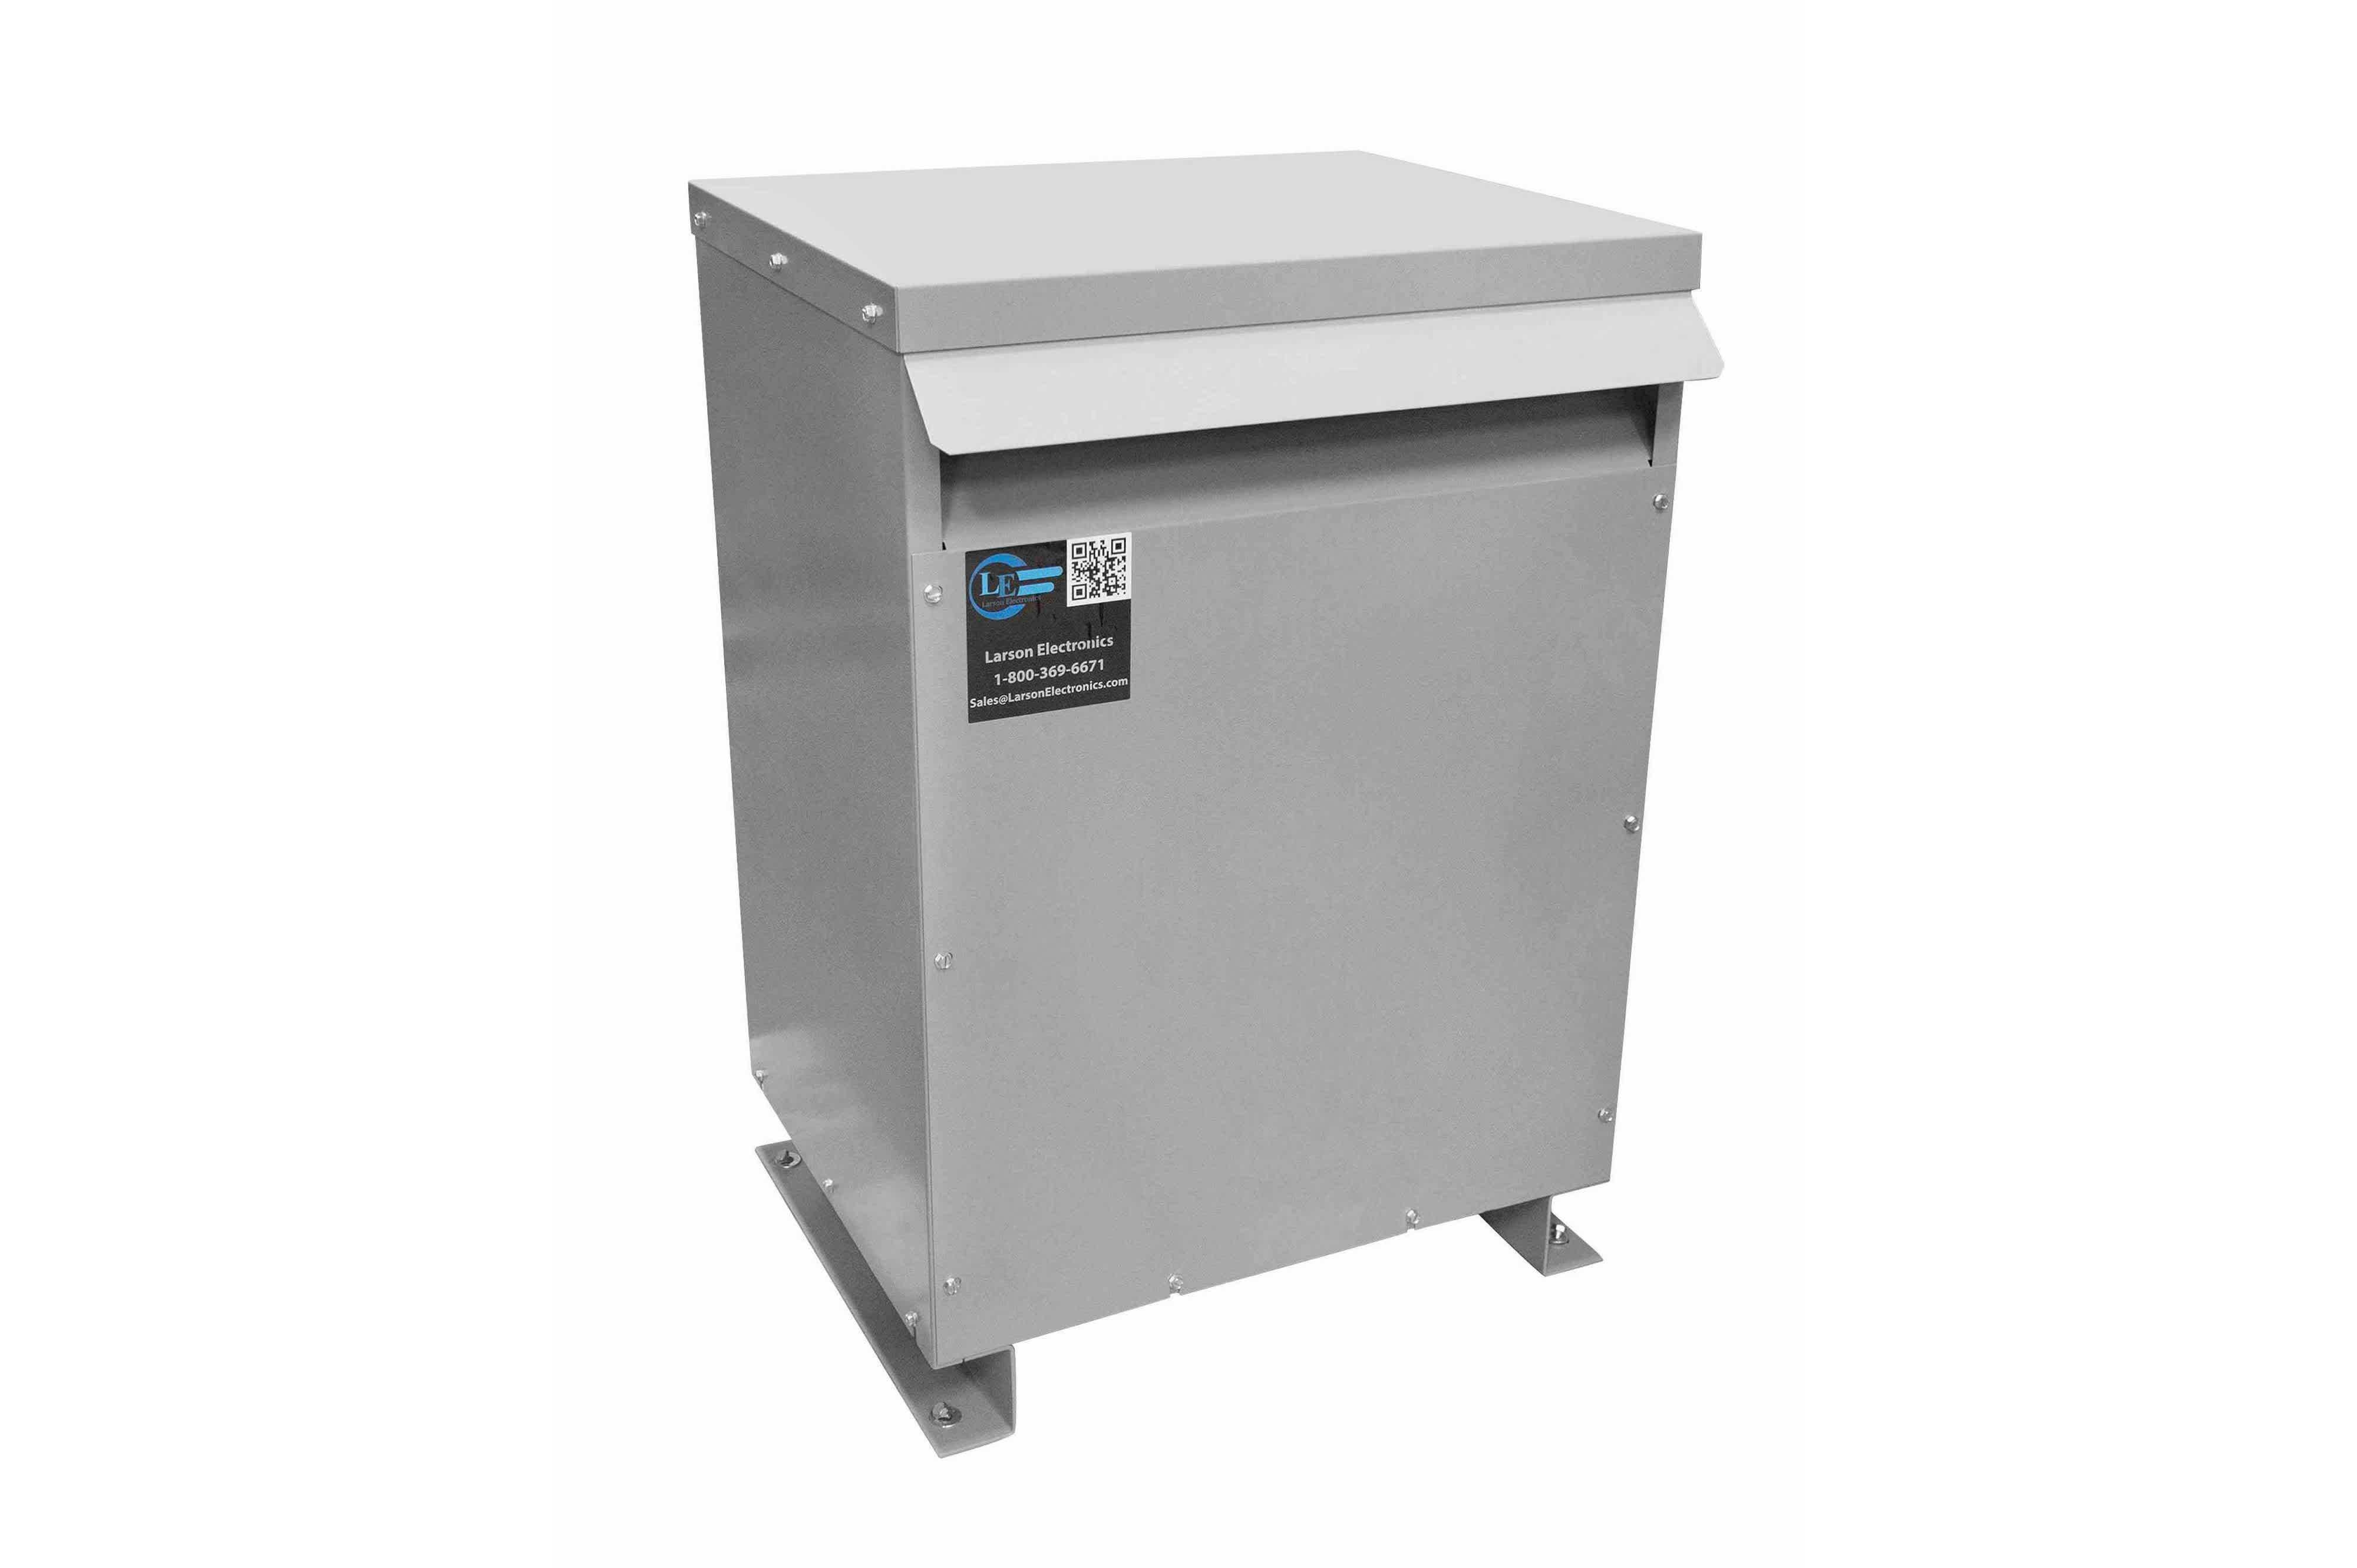 28 kVA 3PH Isolation Transformer, 380V Wye Primary, 240V Delta Secondary, N3R, Ventilated, 60 Hz